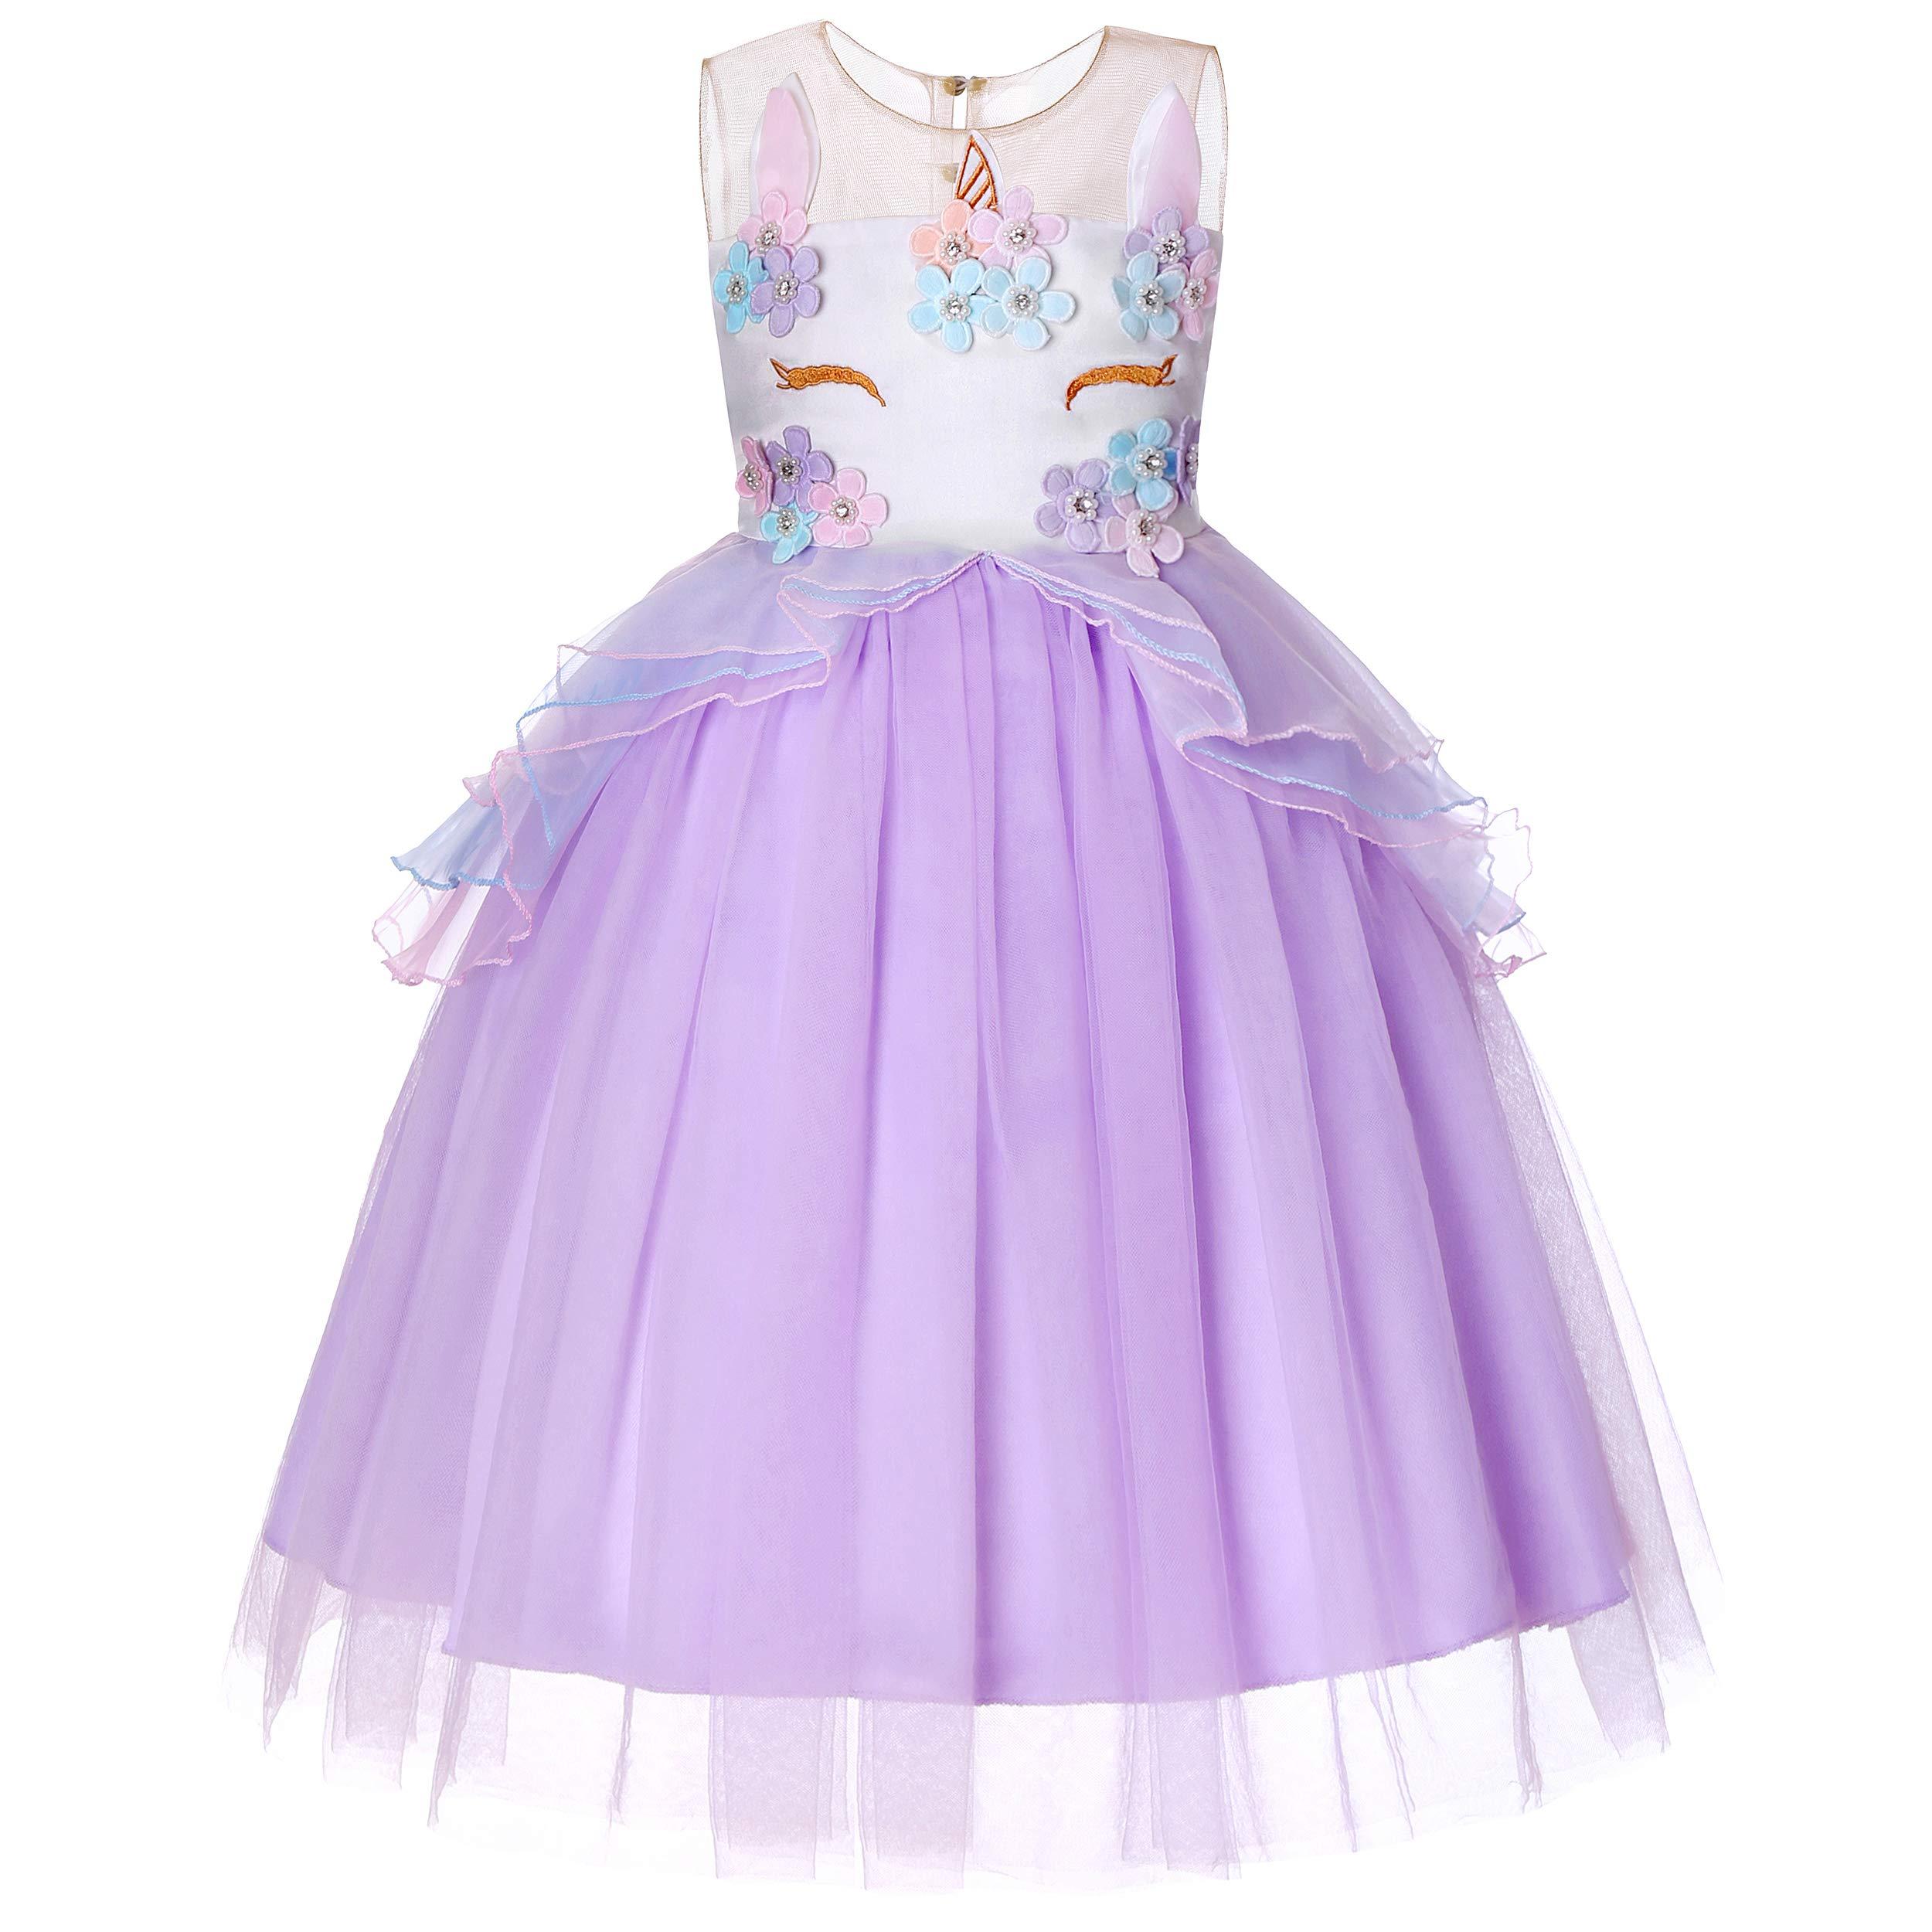 Molliya Unicorn Costume Dress Girl Princess Pageant Party Dresses Flower Evening Gowns Tutu Fancy Dress